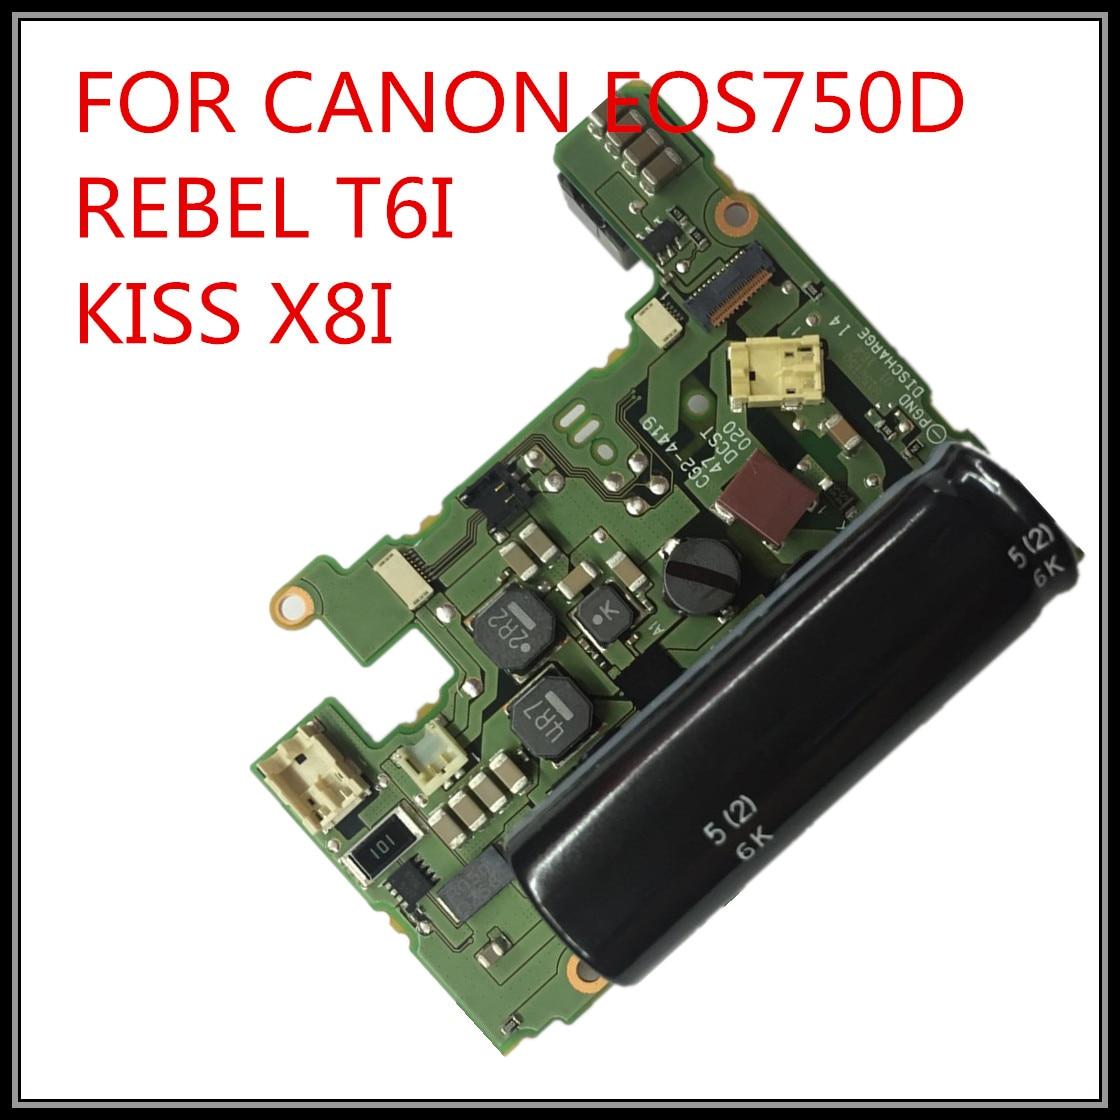 100% nueva placa de alimentación original para canon EOS 750D Rebel T6i Kiss X8i 750D Reparación de cámaras DSLR envío gratis